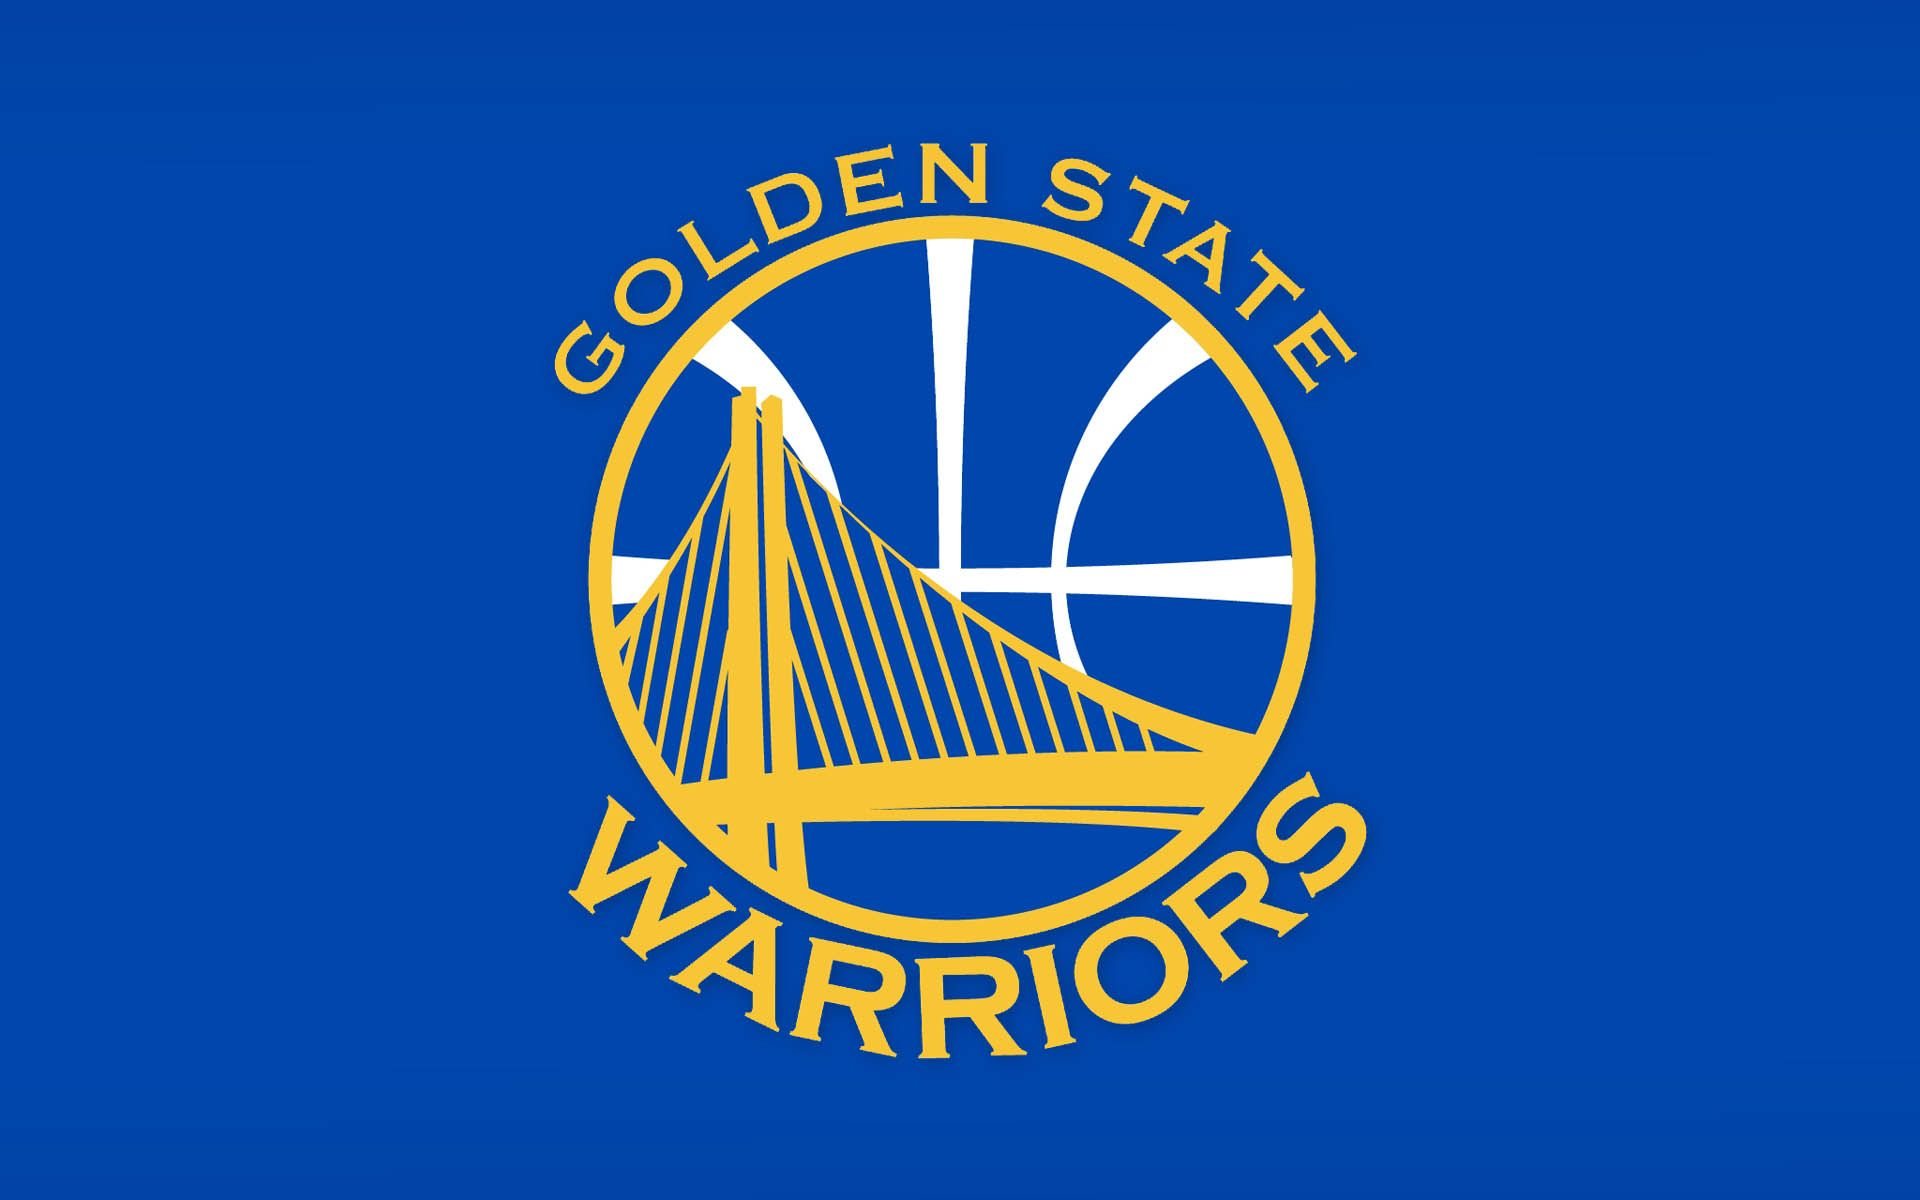 Golden State Warriors Logo Wallpapers Top Free Golden State Warriors Logo Backgrounds Wallpaperaccess